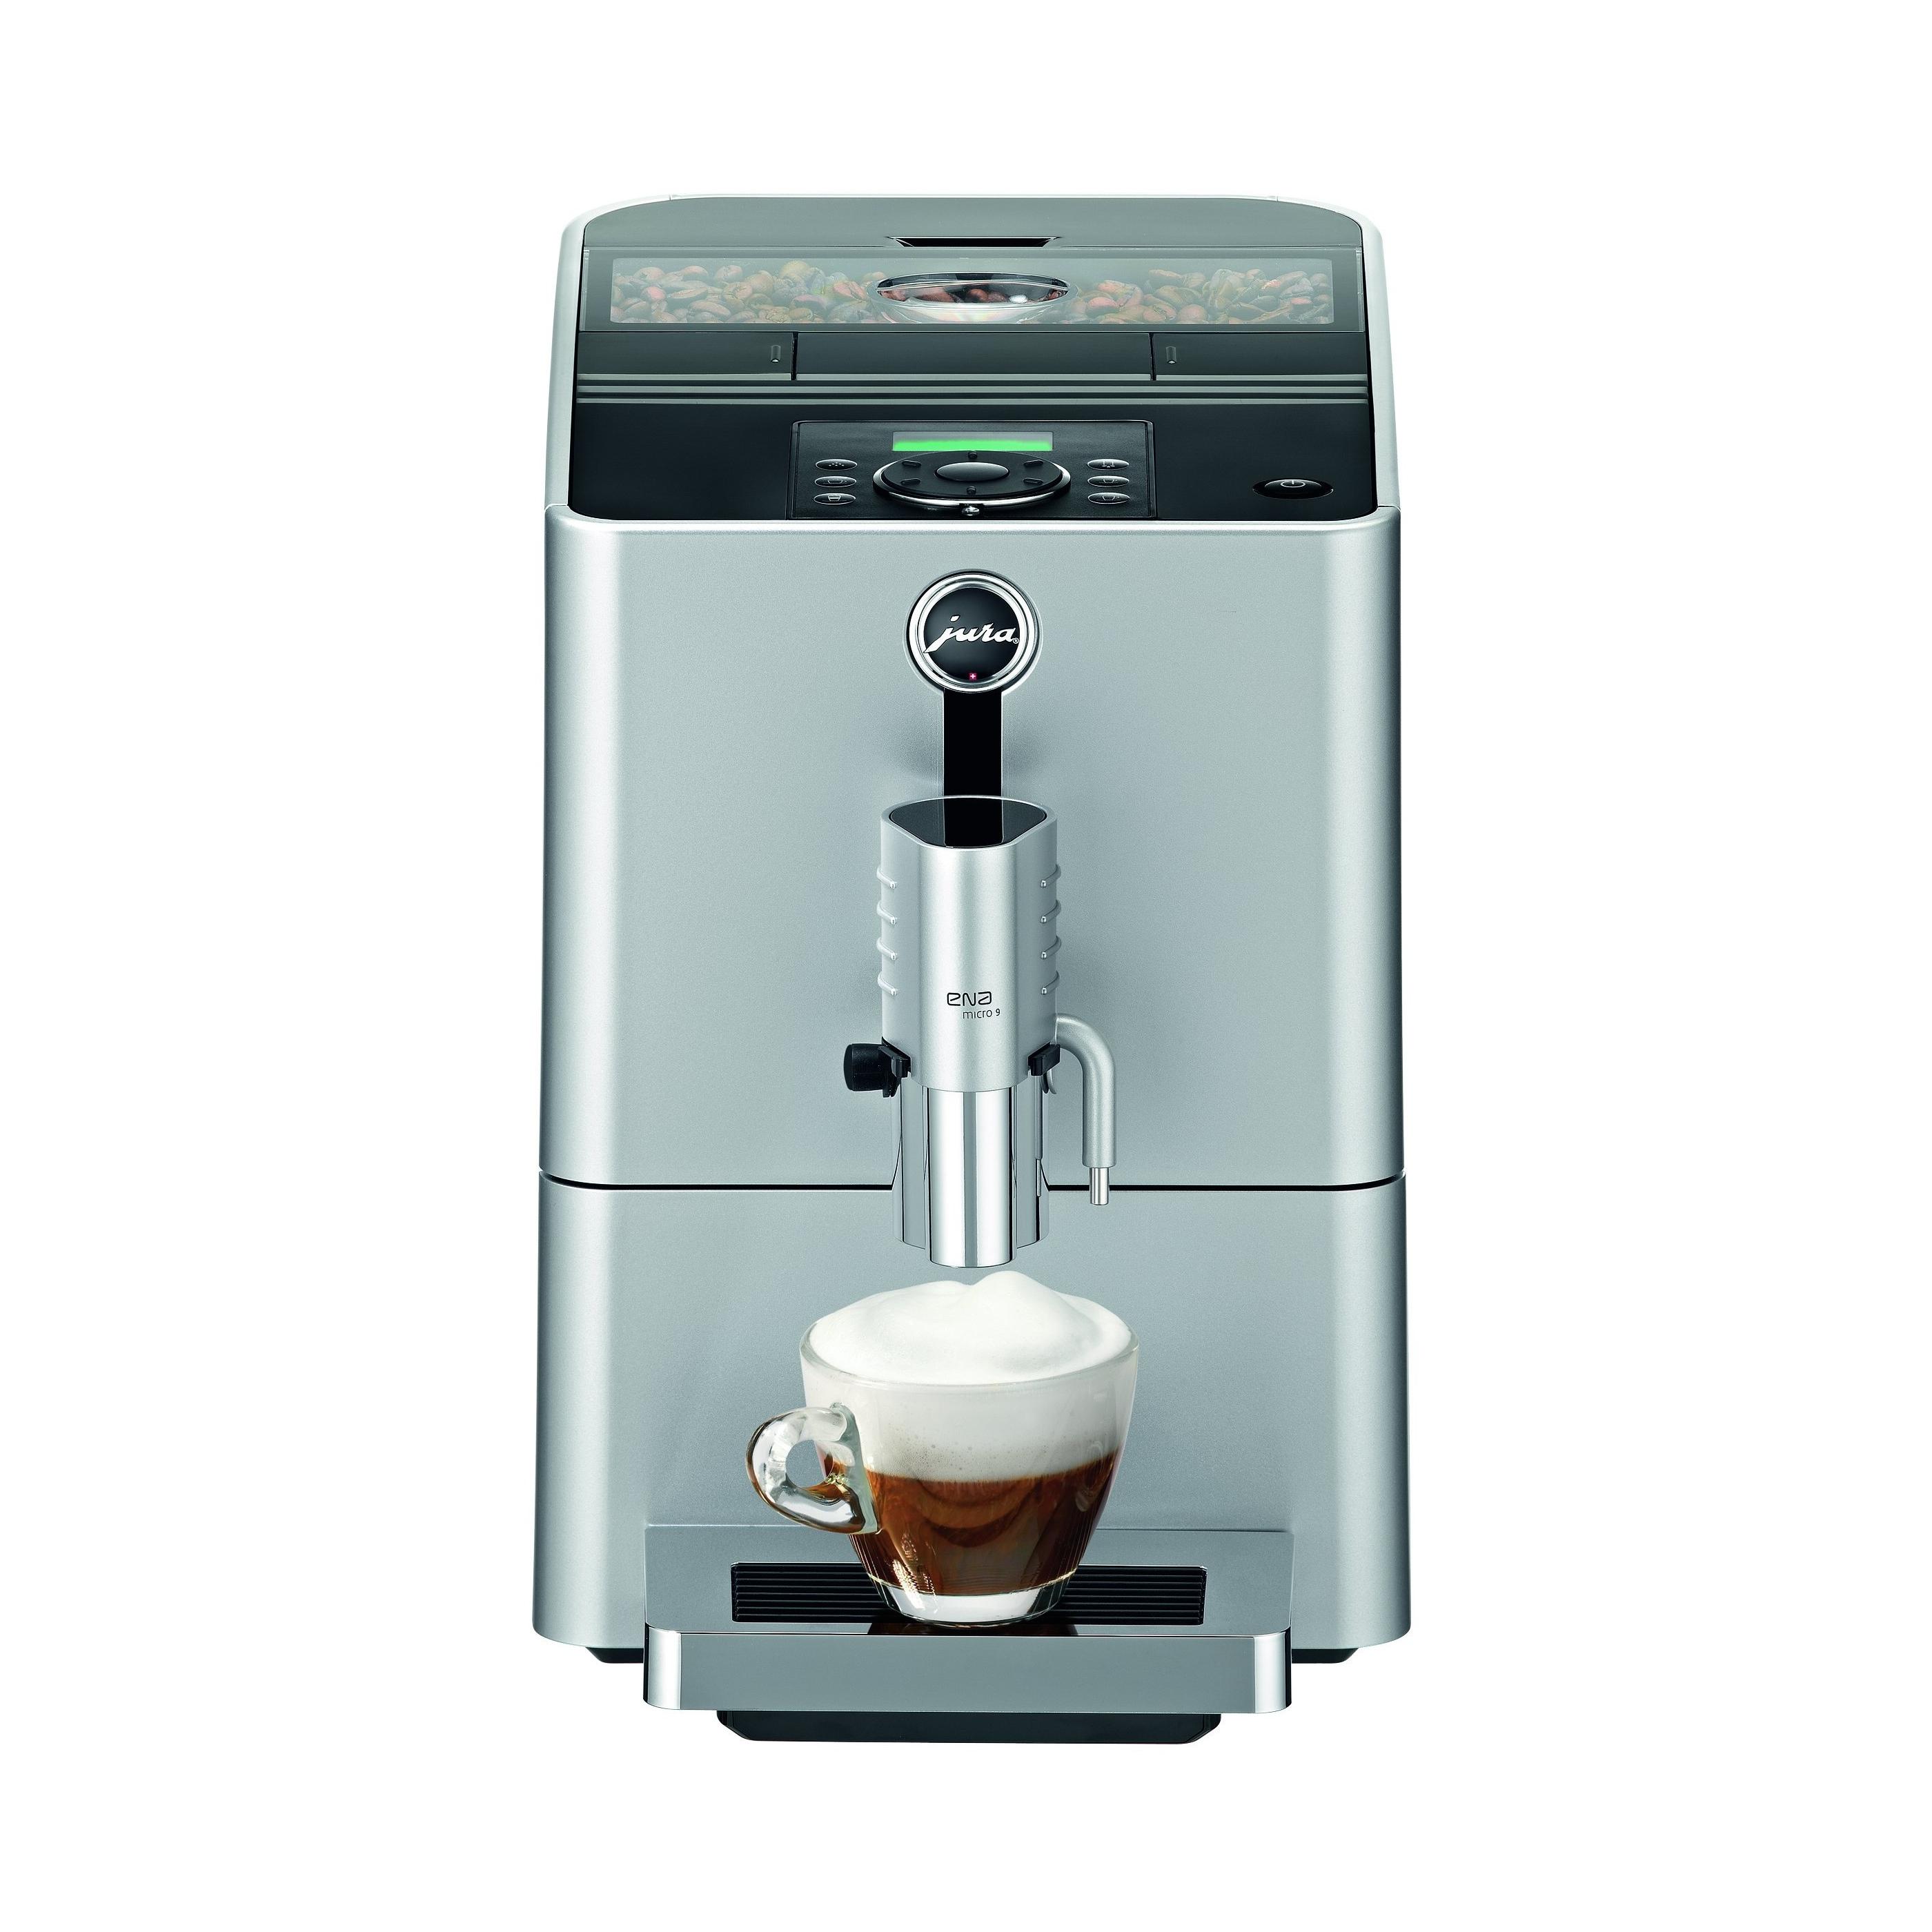 jura ena micro 9 coffee vending machines coffee machine rentals. Black Bedroom Furniture Sets. Home Design Ideas